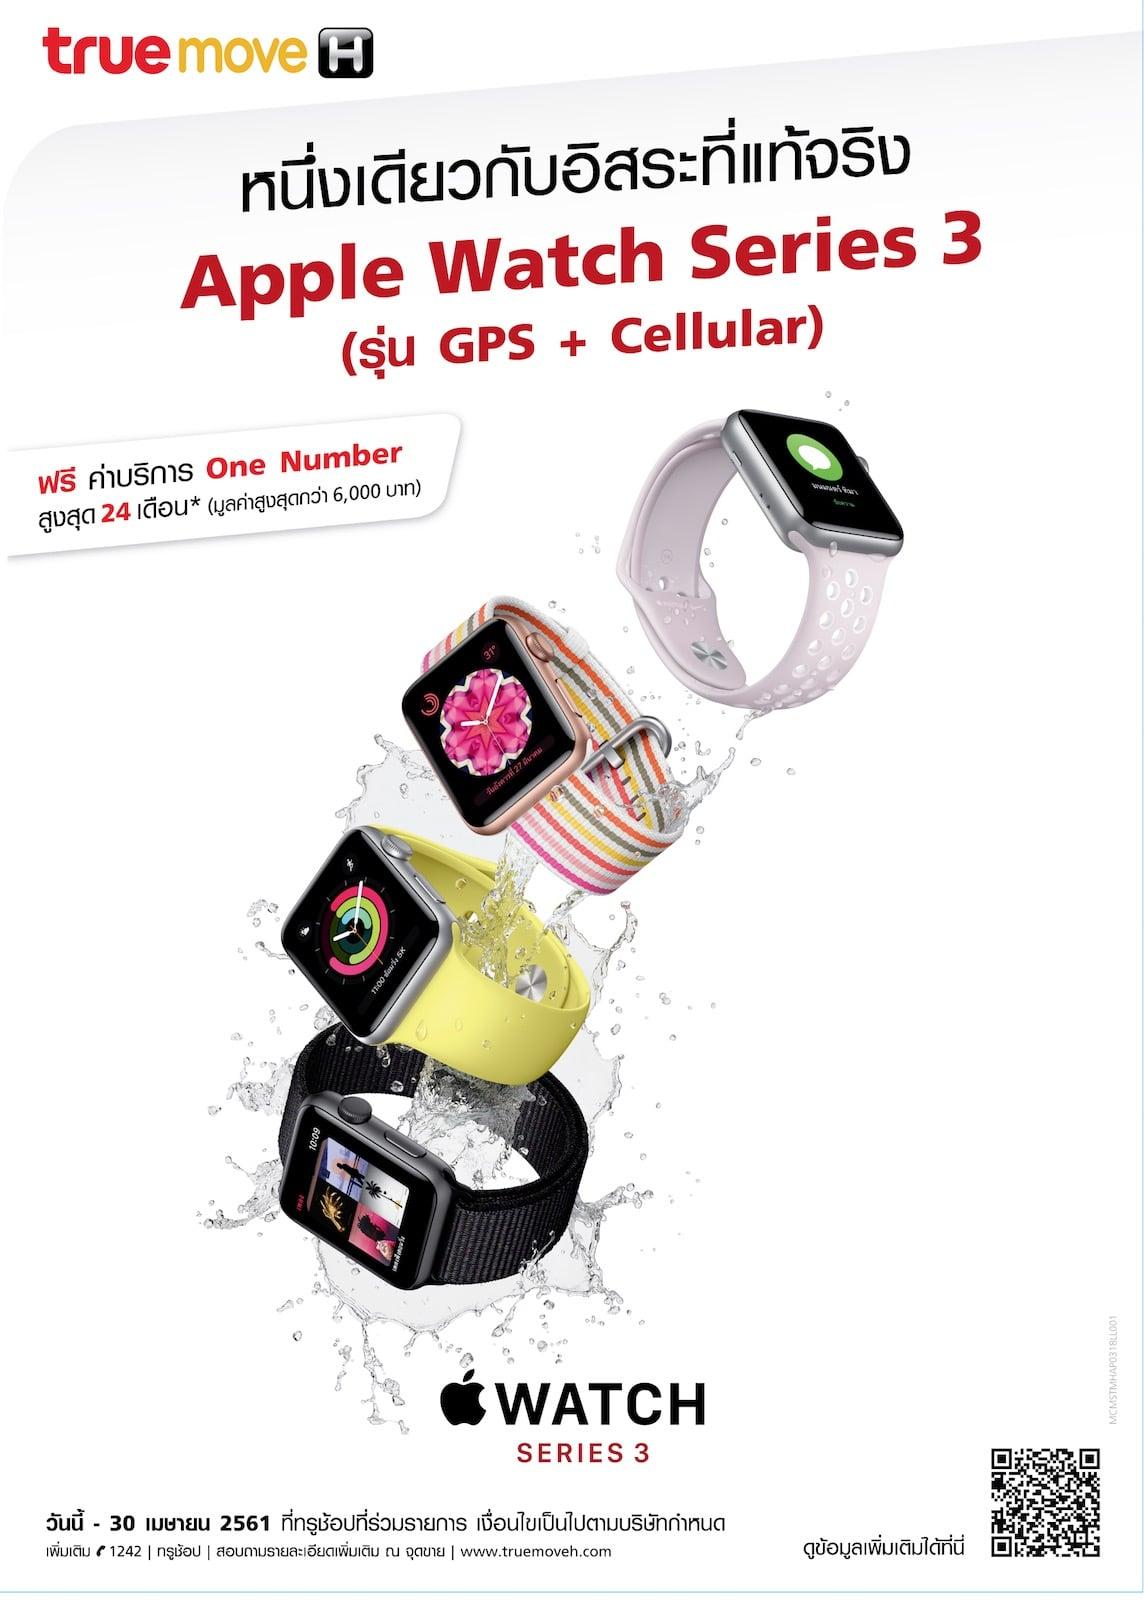 apple-watch-series-3-truemove-h-1